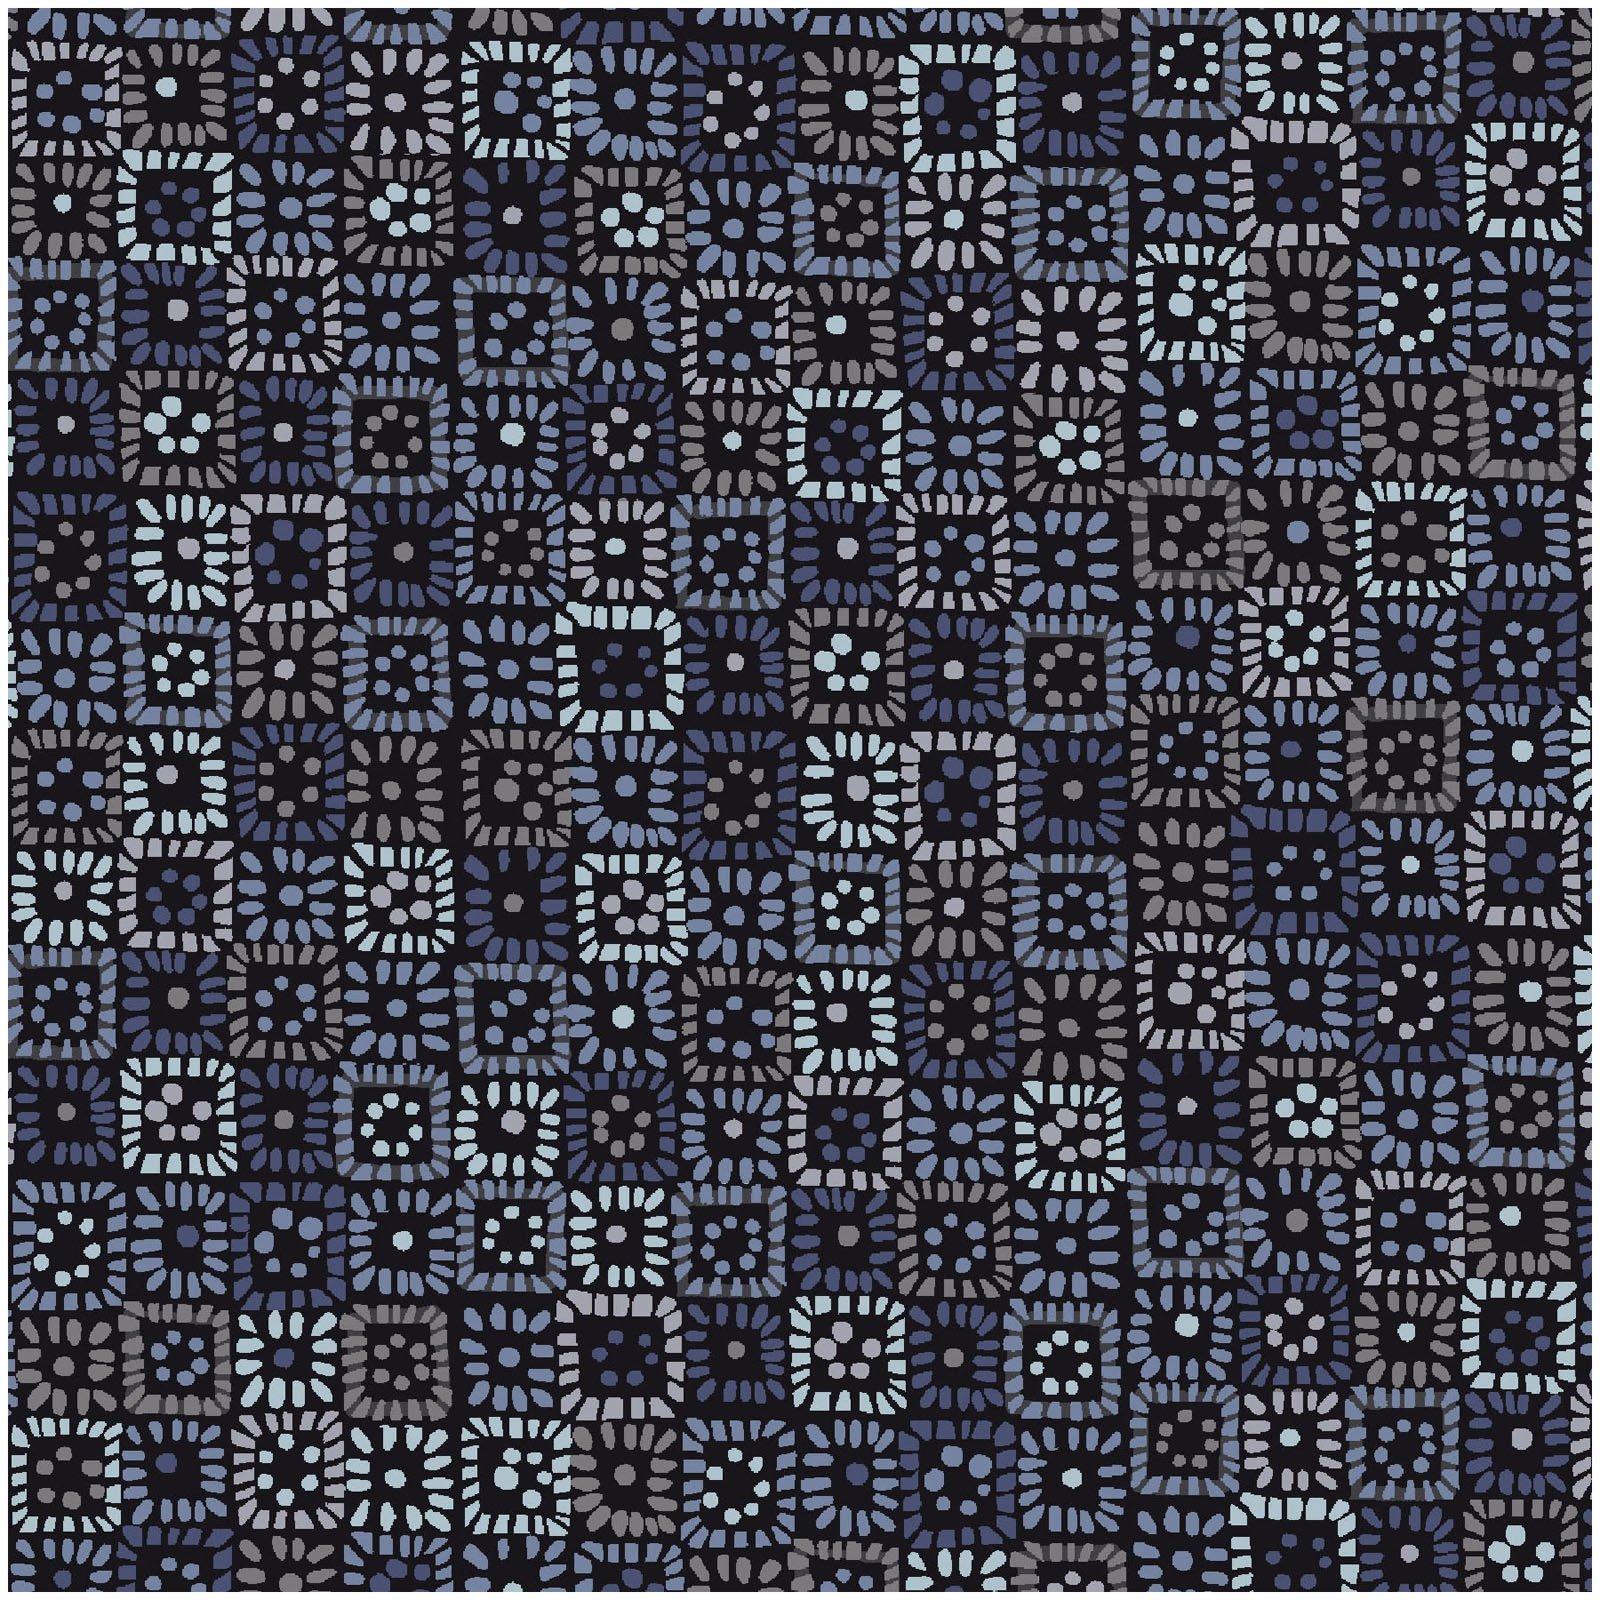 KASK-4232 B - KASHMIR KALEIDOSCOPE BY P&B BOUTIQUE SQUARES BLUE